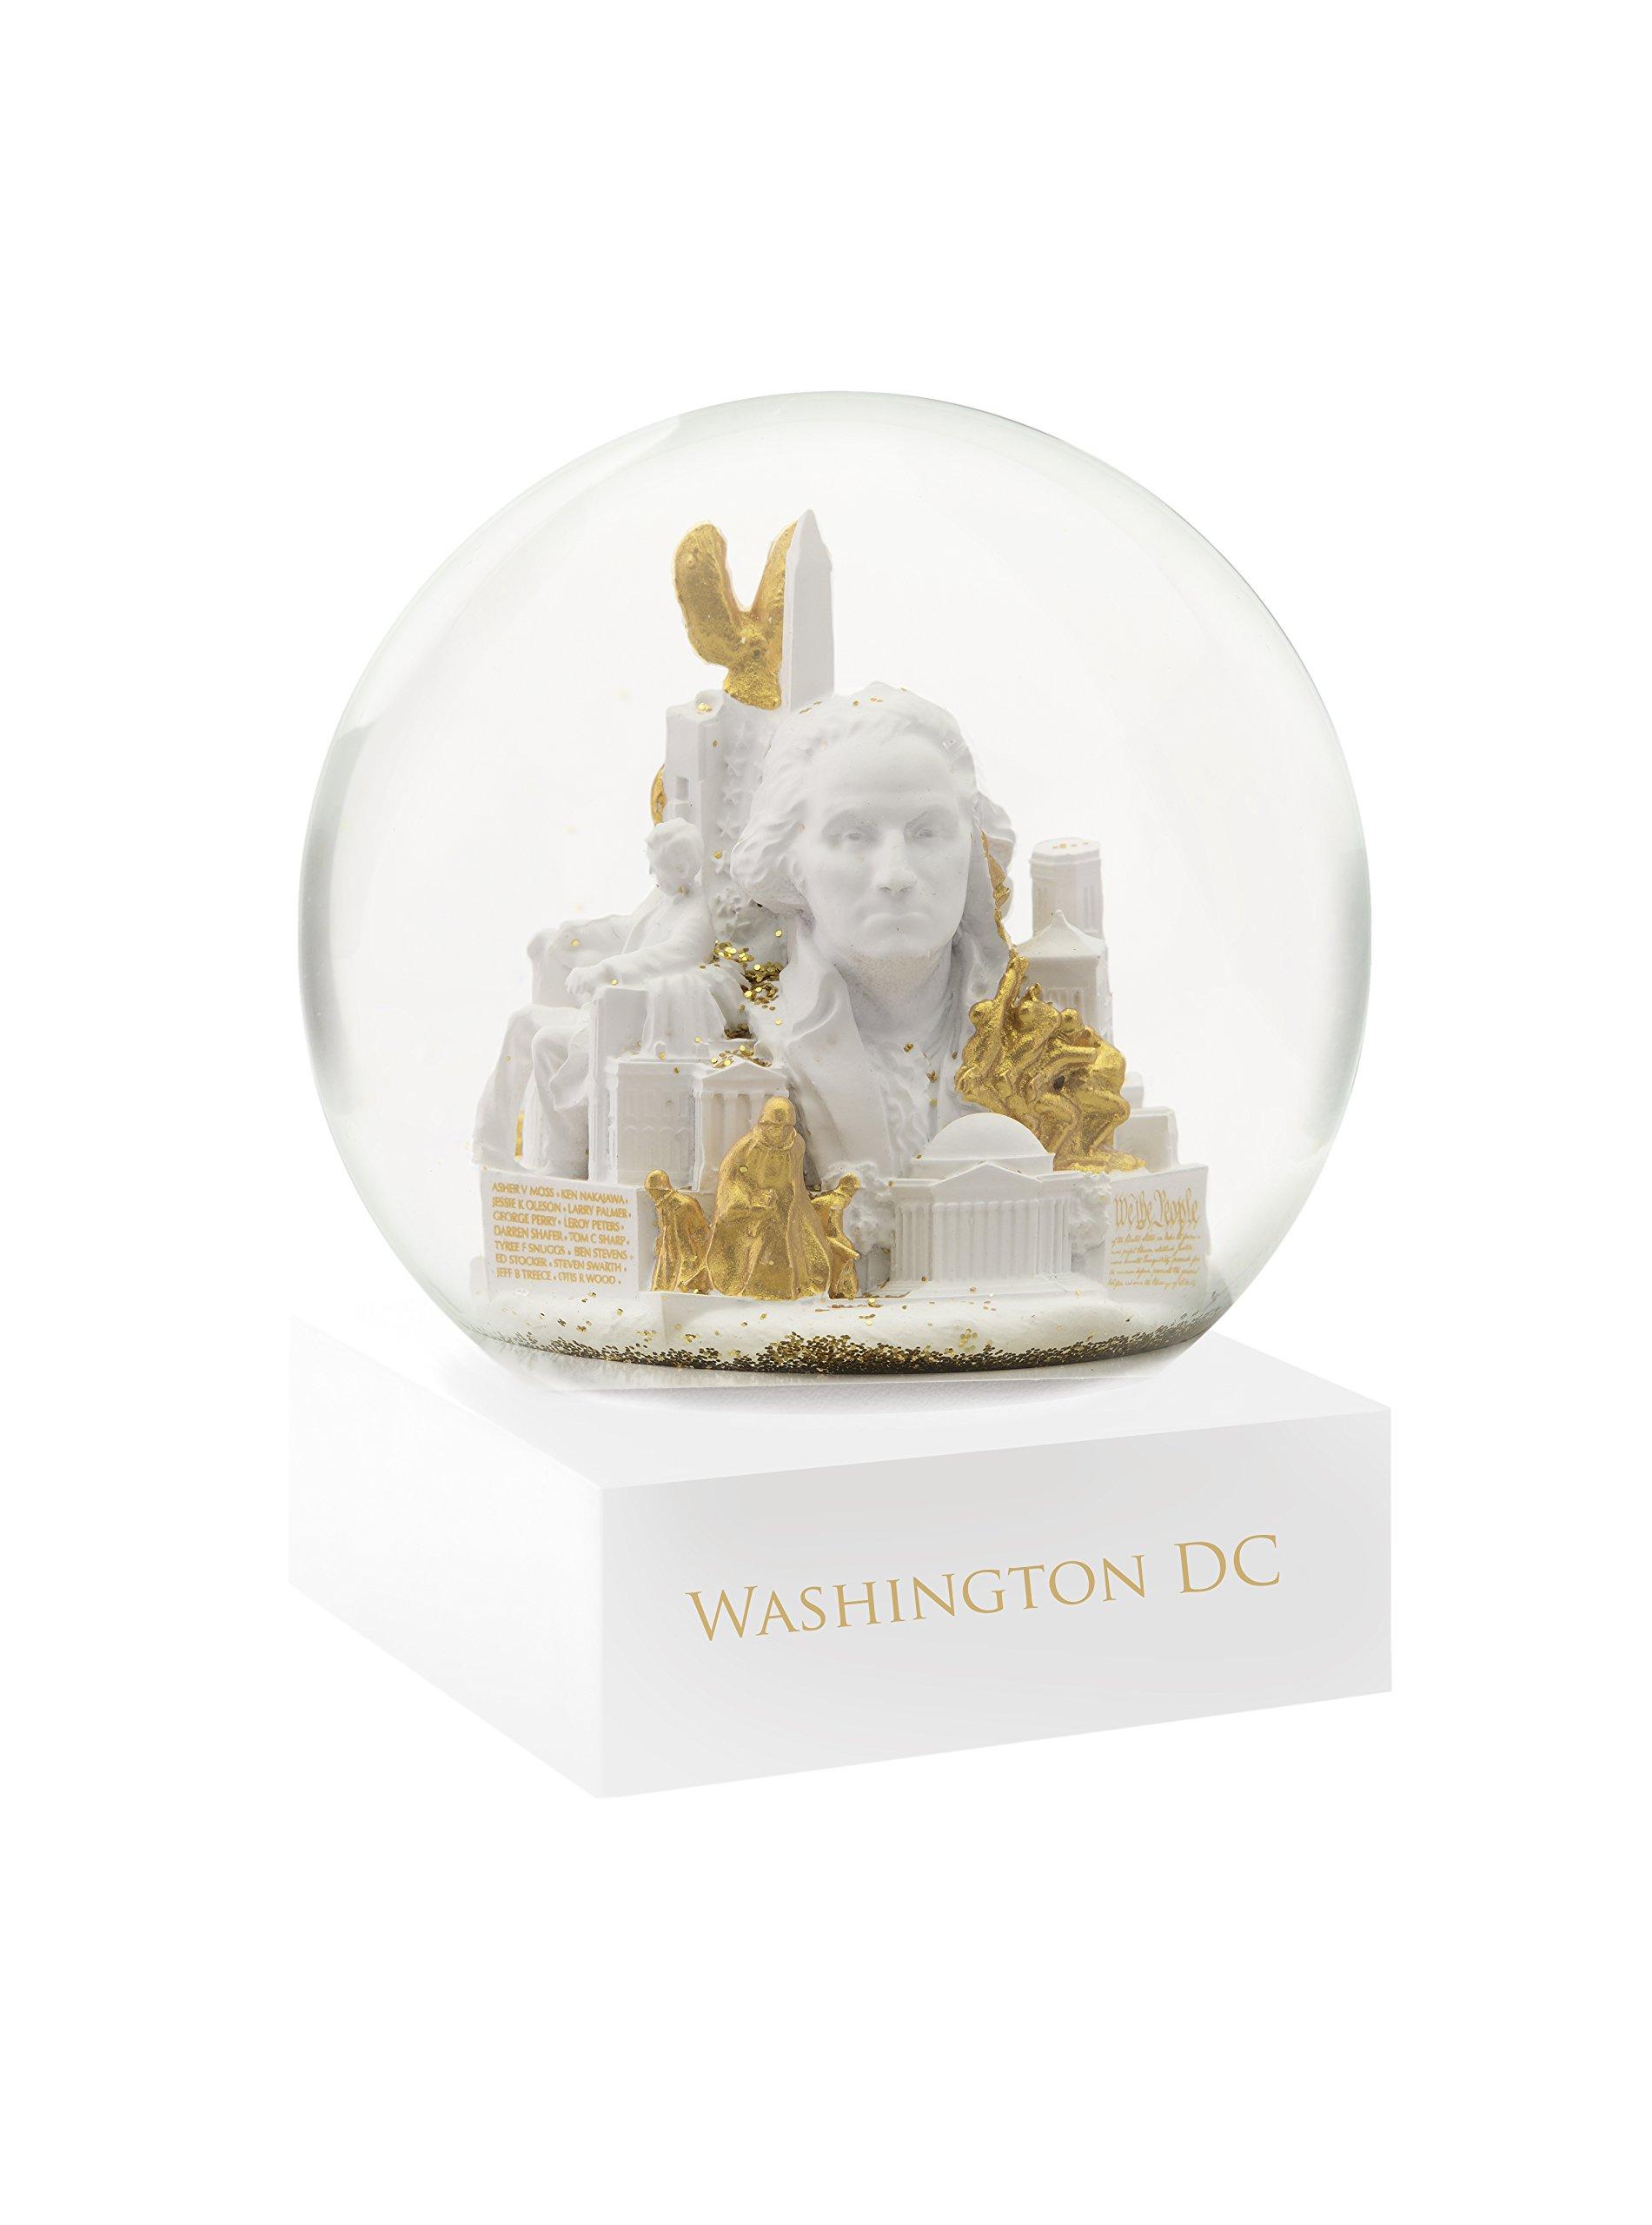 CoolSnowGlobes Washington, D.C. Cool Snow Globe